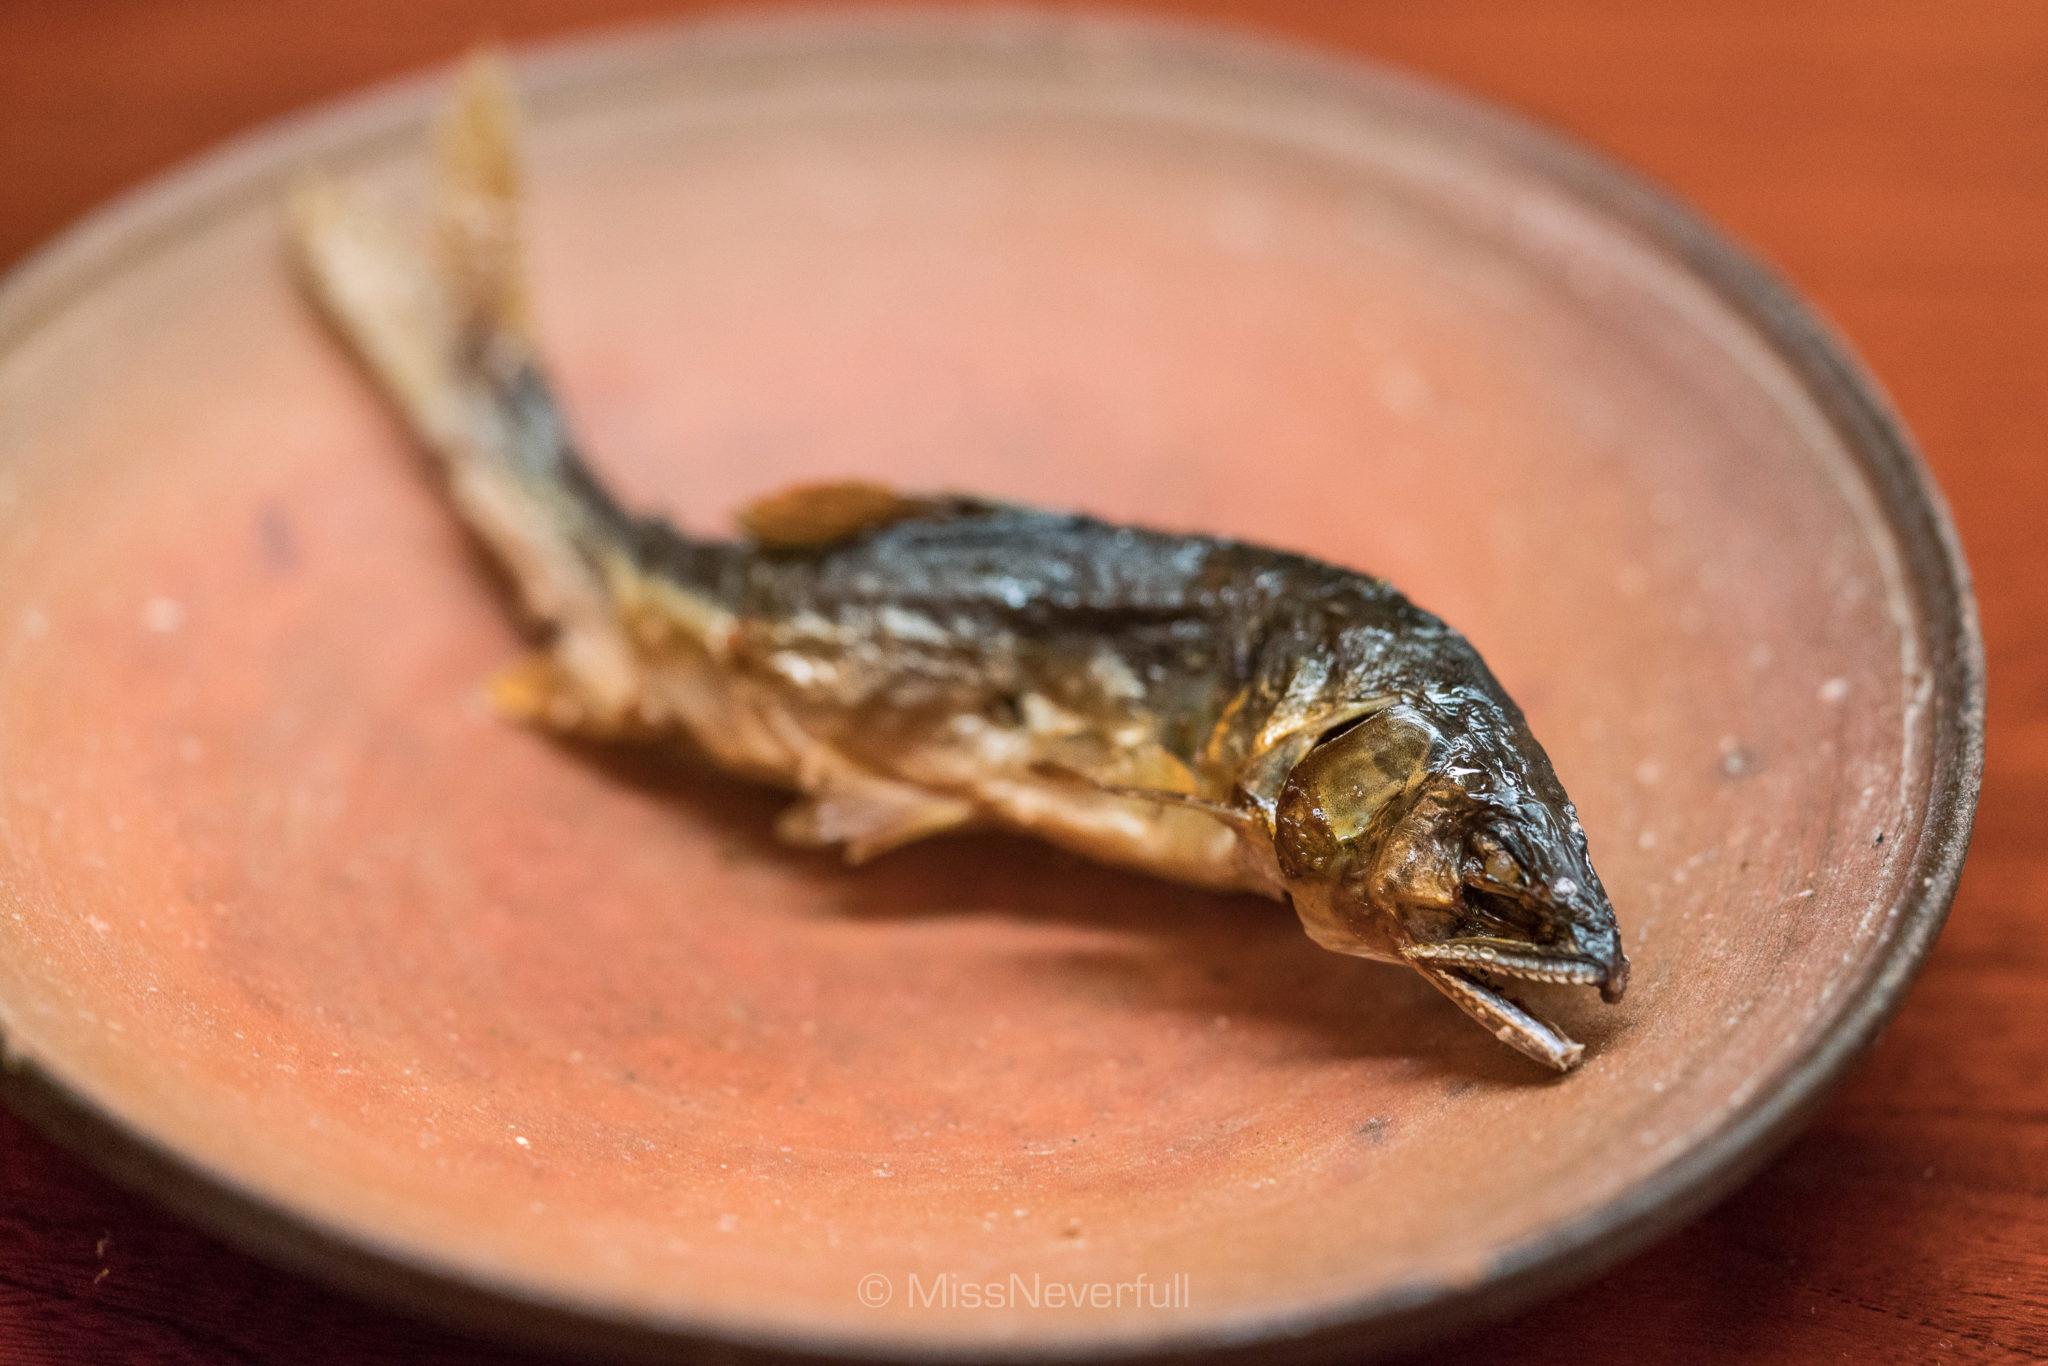 7. Grilled Ayu fish from Ado-gawa lake (滋賀県安曇川と針畑川の鮎焼き)